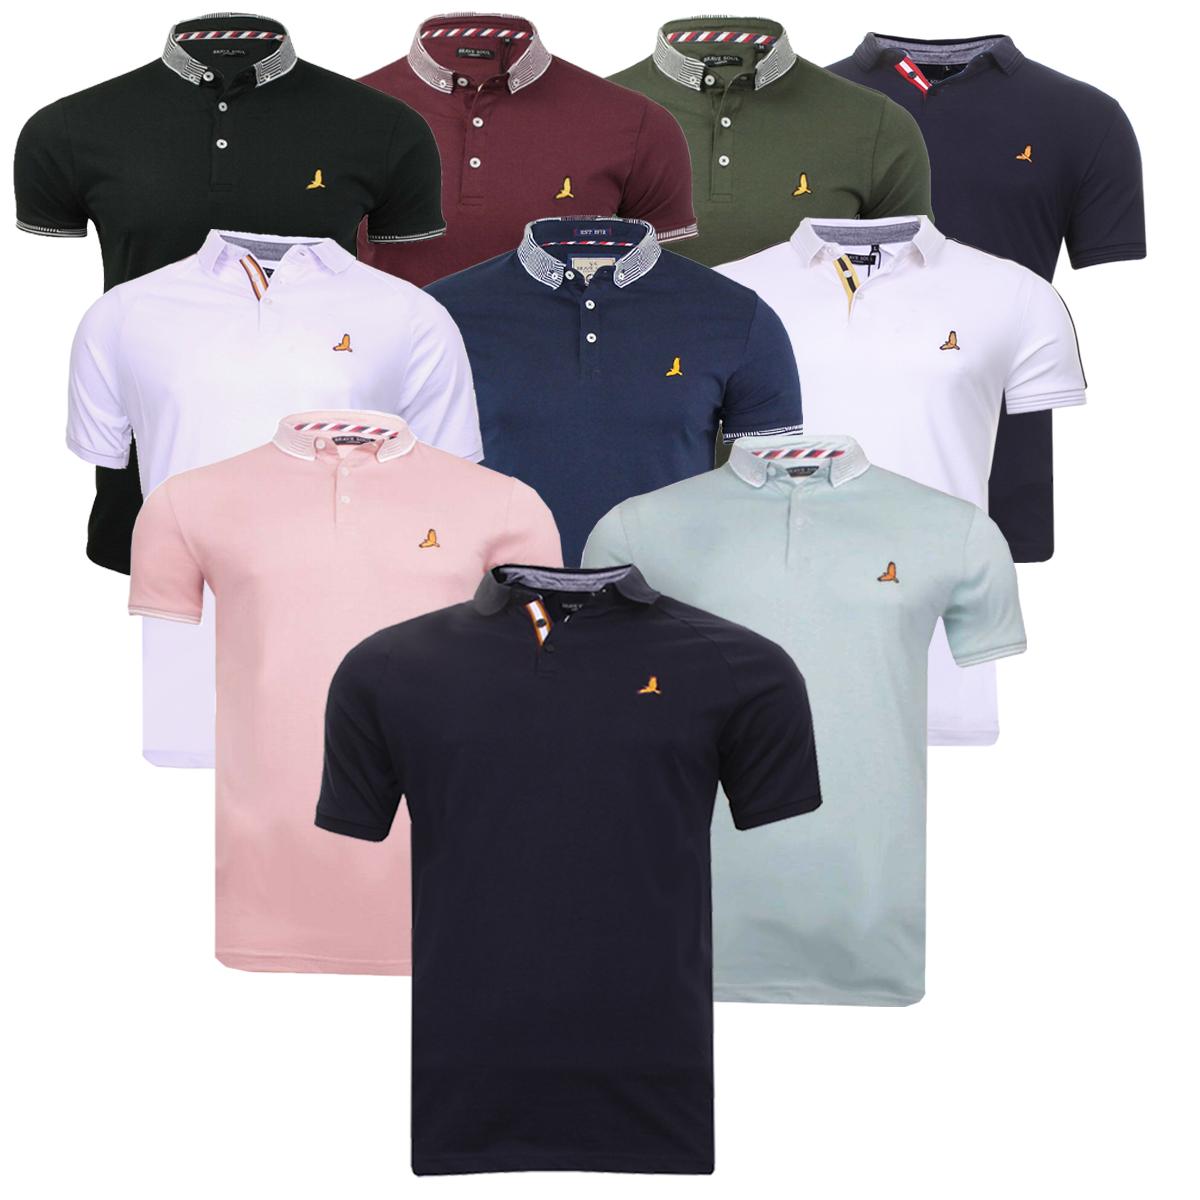 9422bf5b69456 Mens Polo Shirt Short Sleeve Cotton Sports Golf Casual Top Brave Soul Plain